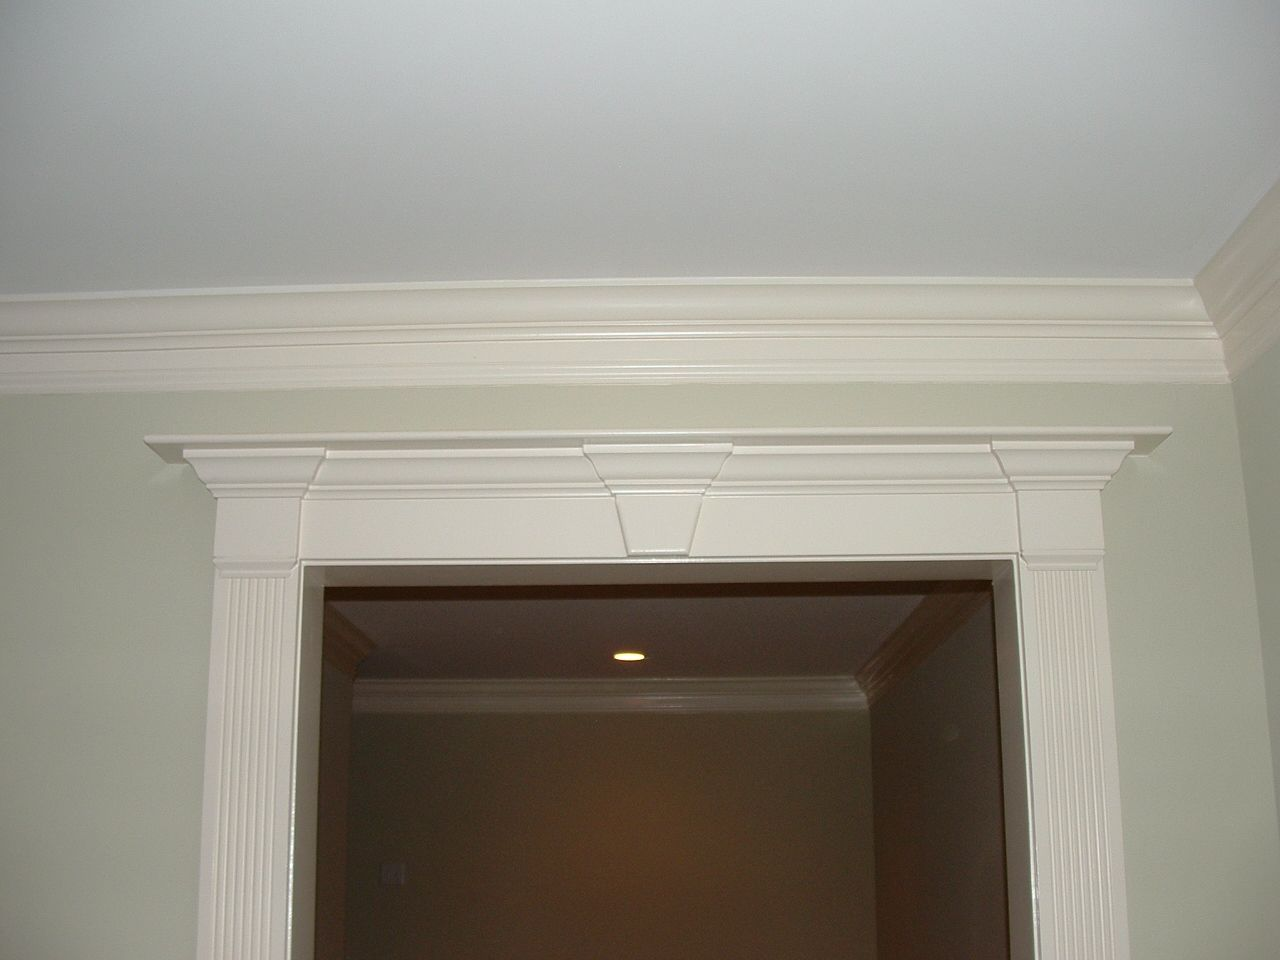 Modern window trim ideas - Trim Moulding Window Moulding Trim Moulds Crown Moulding